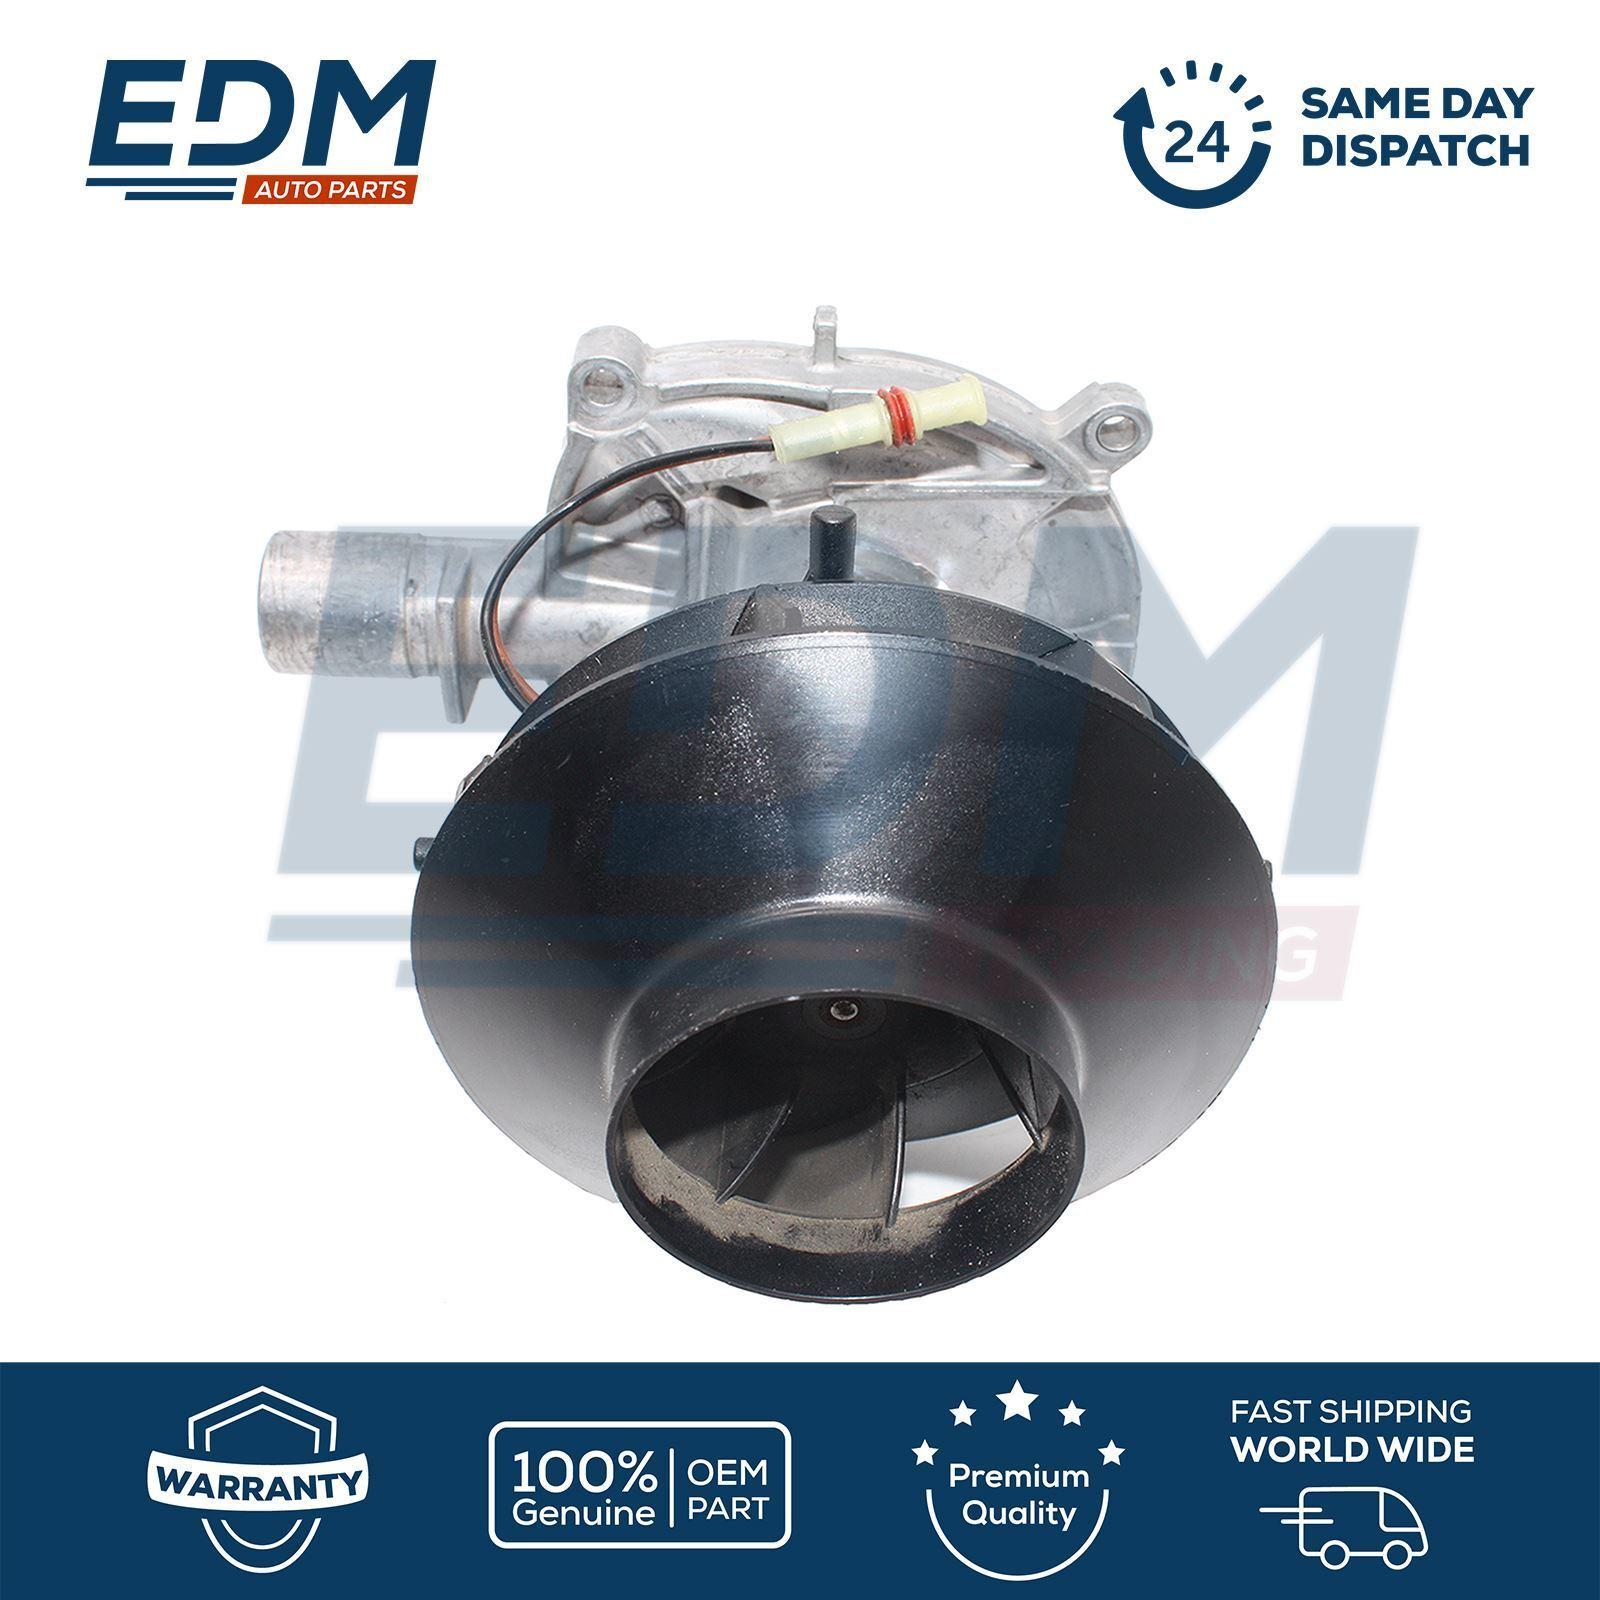 EBERSPACHER Airtronic D4 24V Gebläse (252114992000) Motor (252114992000) Gebläse 3ed099